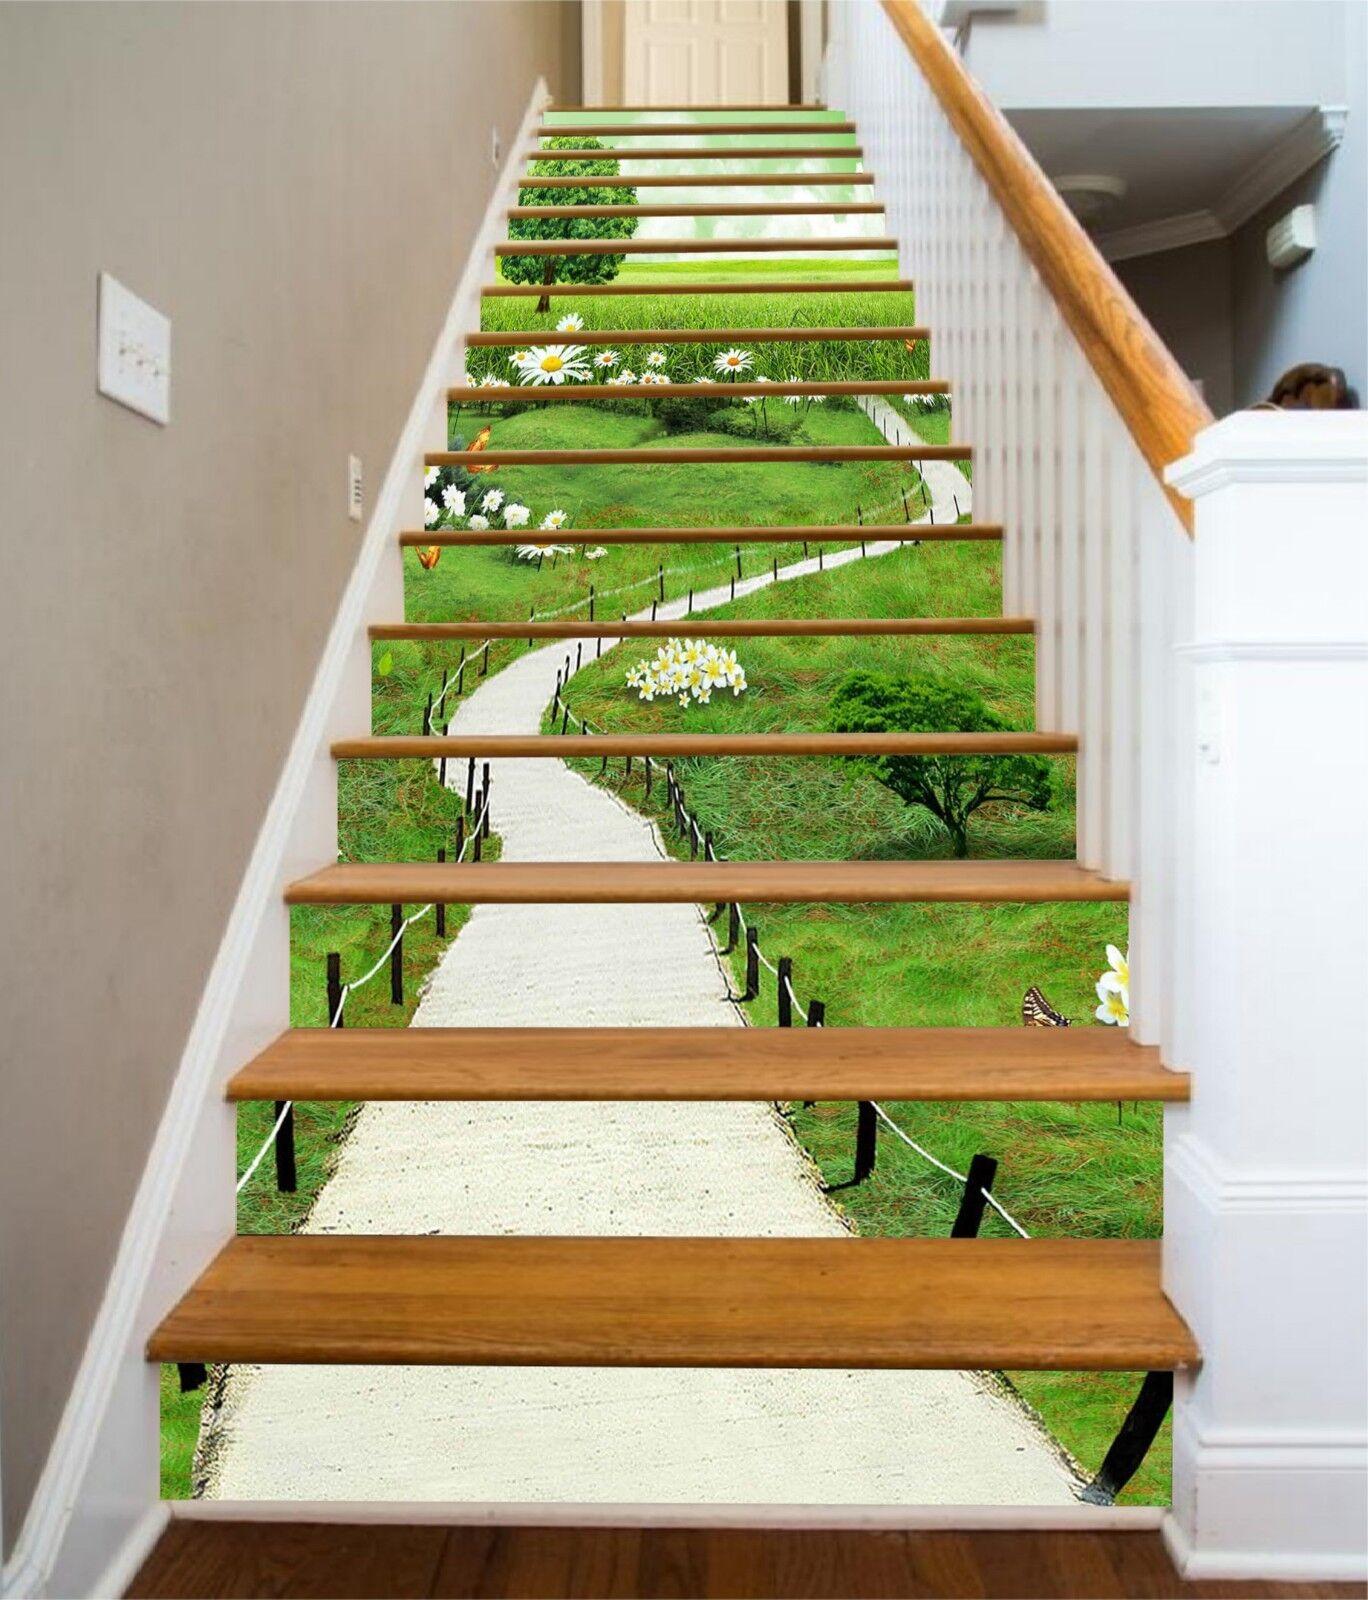 3D Bridge Lawn Stair Risers Decoration Photo Mural Vinyl Decal Wallpaper UK